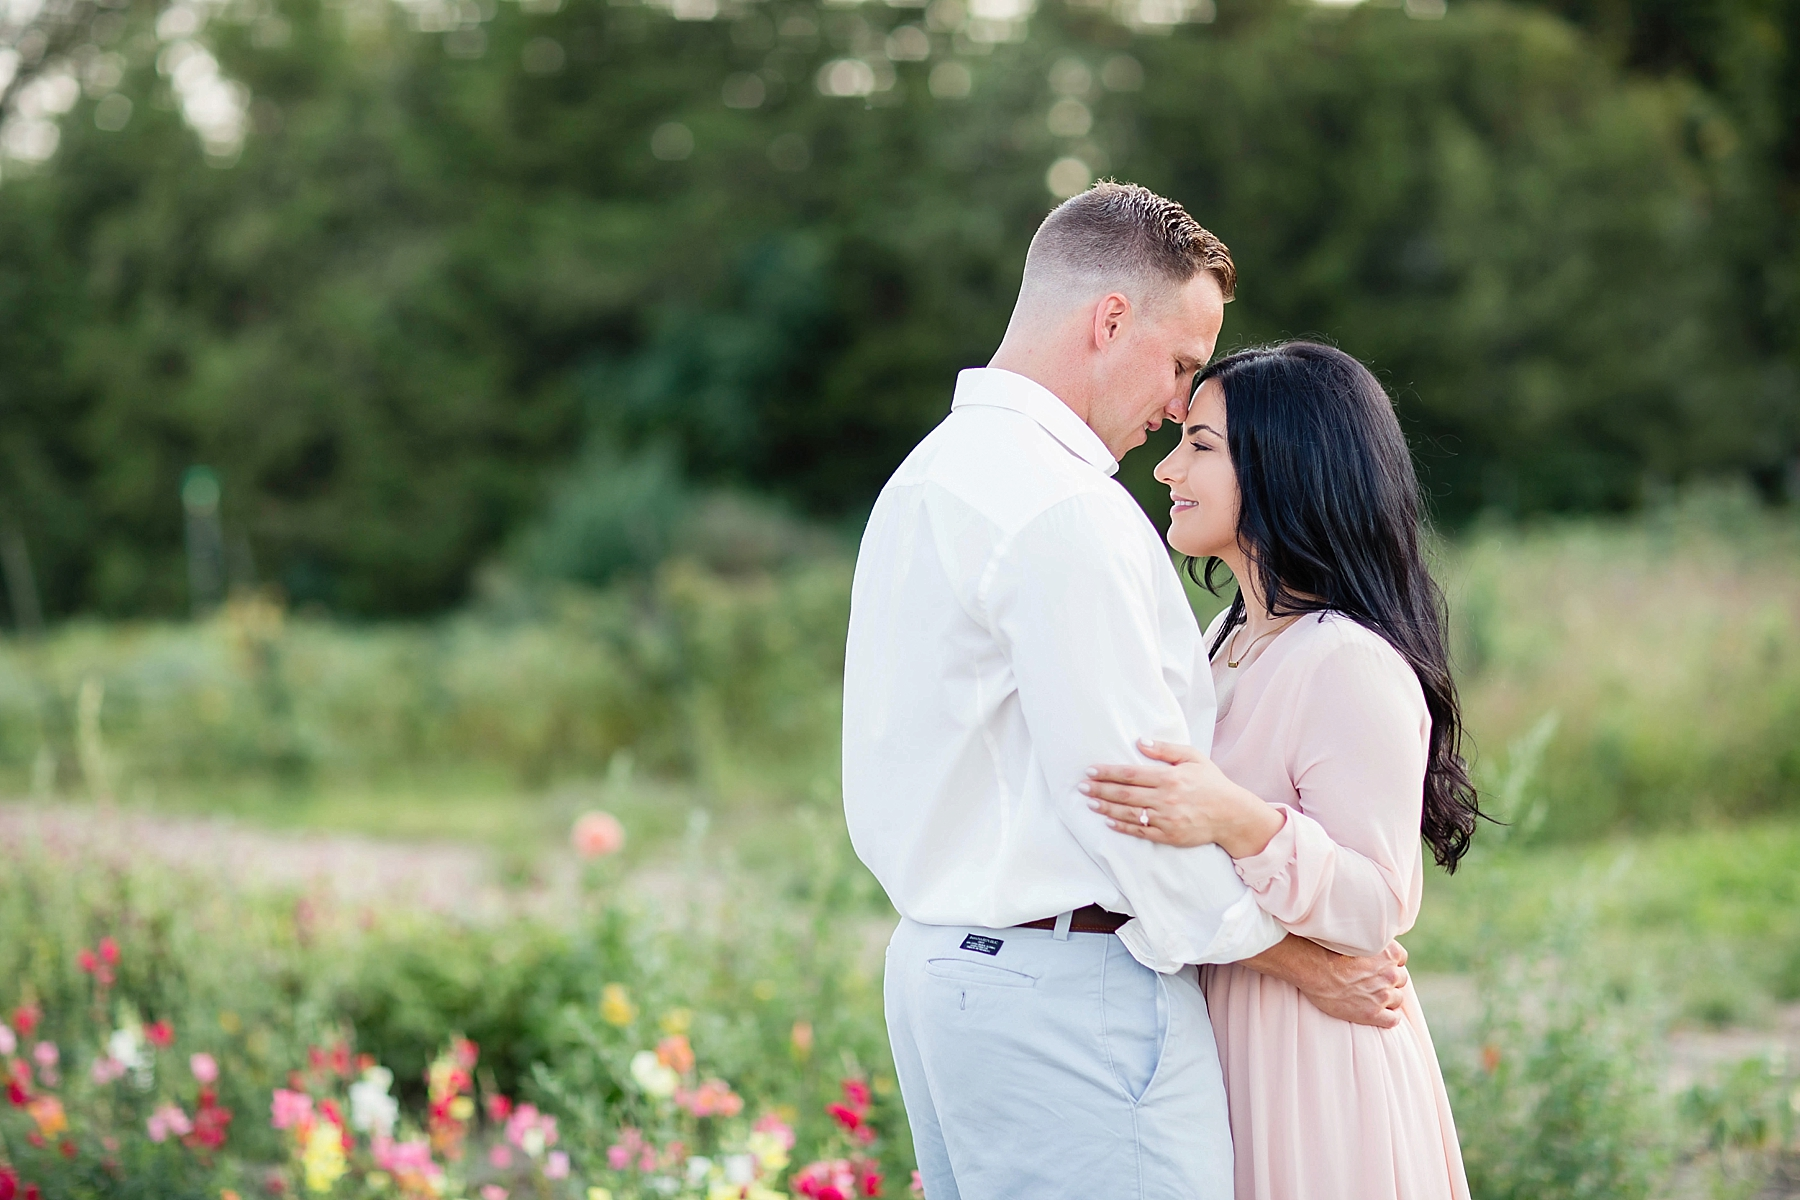 windsor-wedding-engagement-photographer-eryn-shea-photography-field-of-flowers_0015.jpg